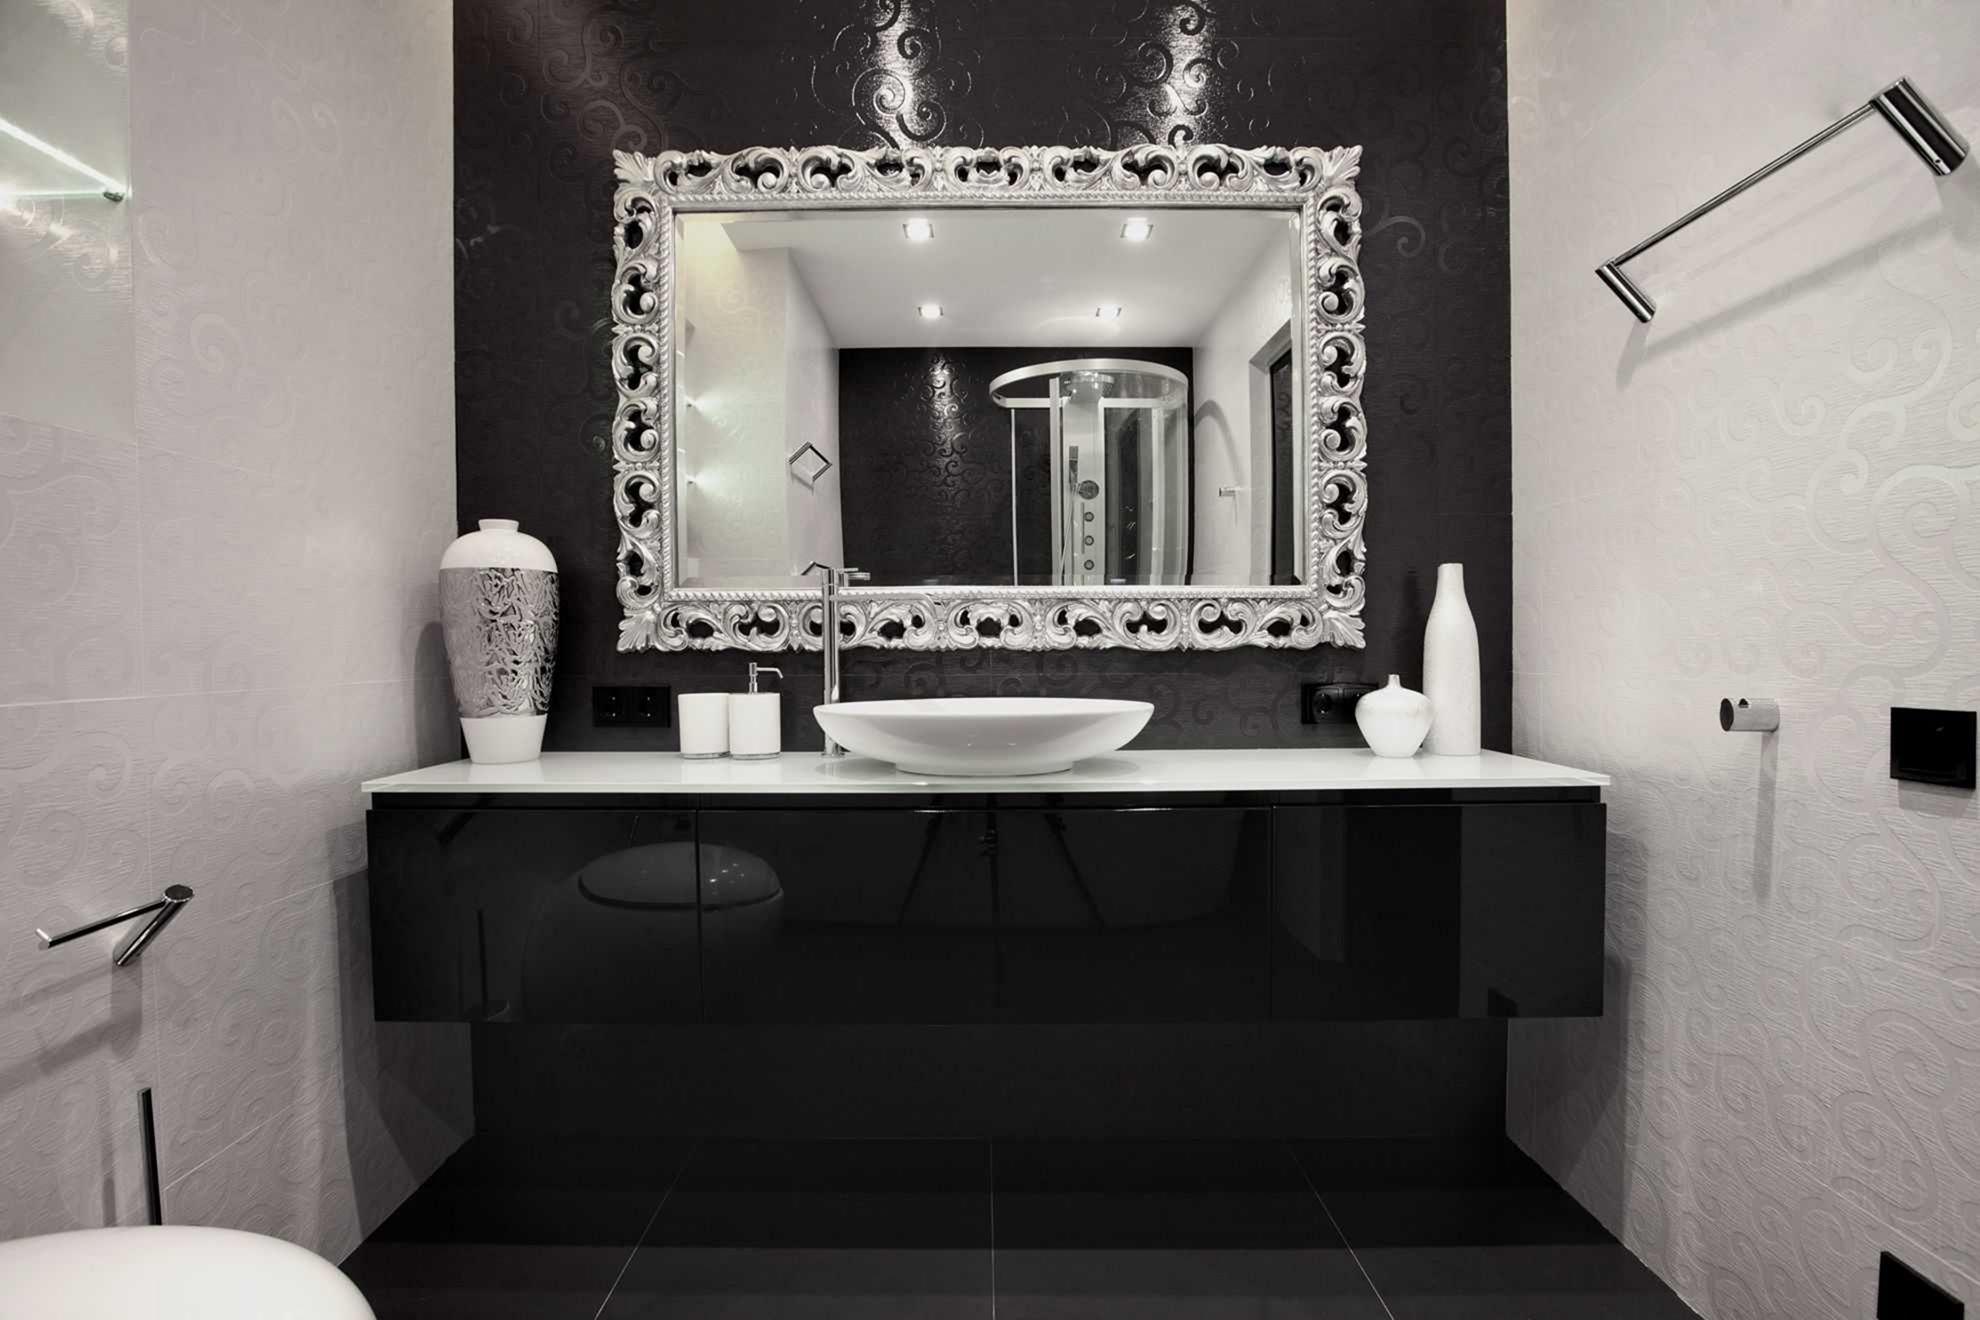 Awesome 20 Perfect Monochrome Color Home Decor Ideas For Your Inspirations Https Decoretoo Co Black Bathroom Decor White Bathroom Decor Black Vanity Bathroom